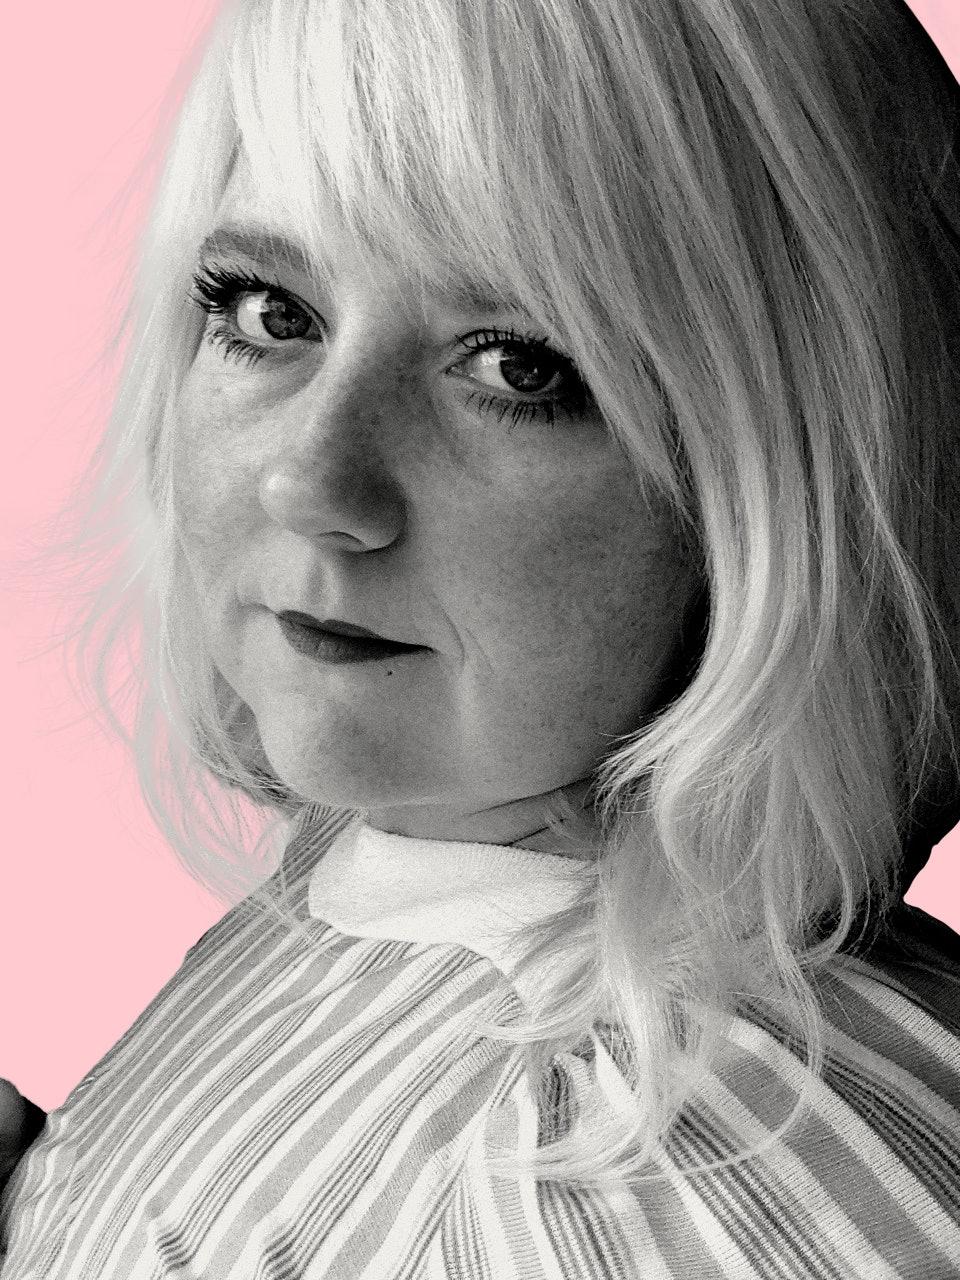 Pandora's Head Of Rock, Crystal Lowe, Makes Music Magic